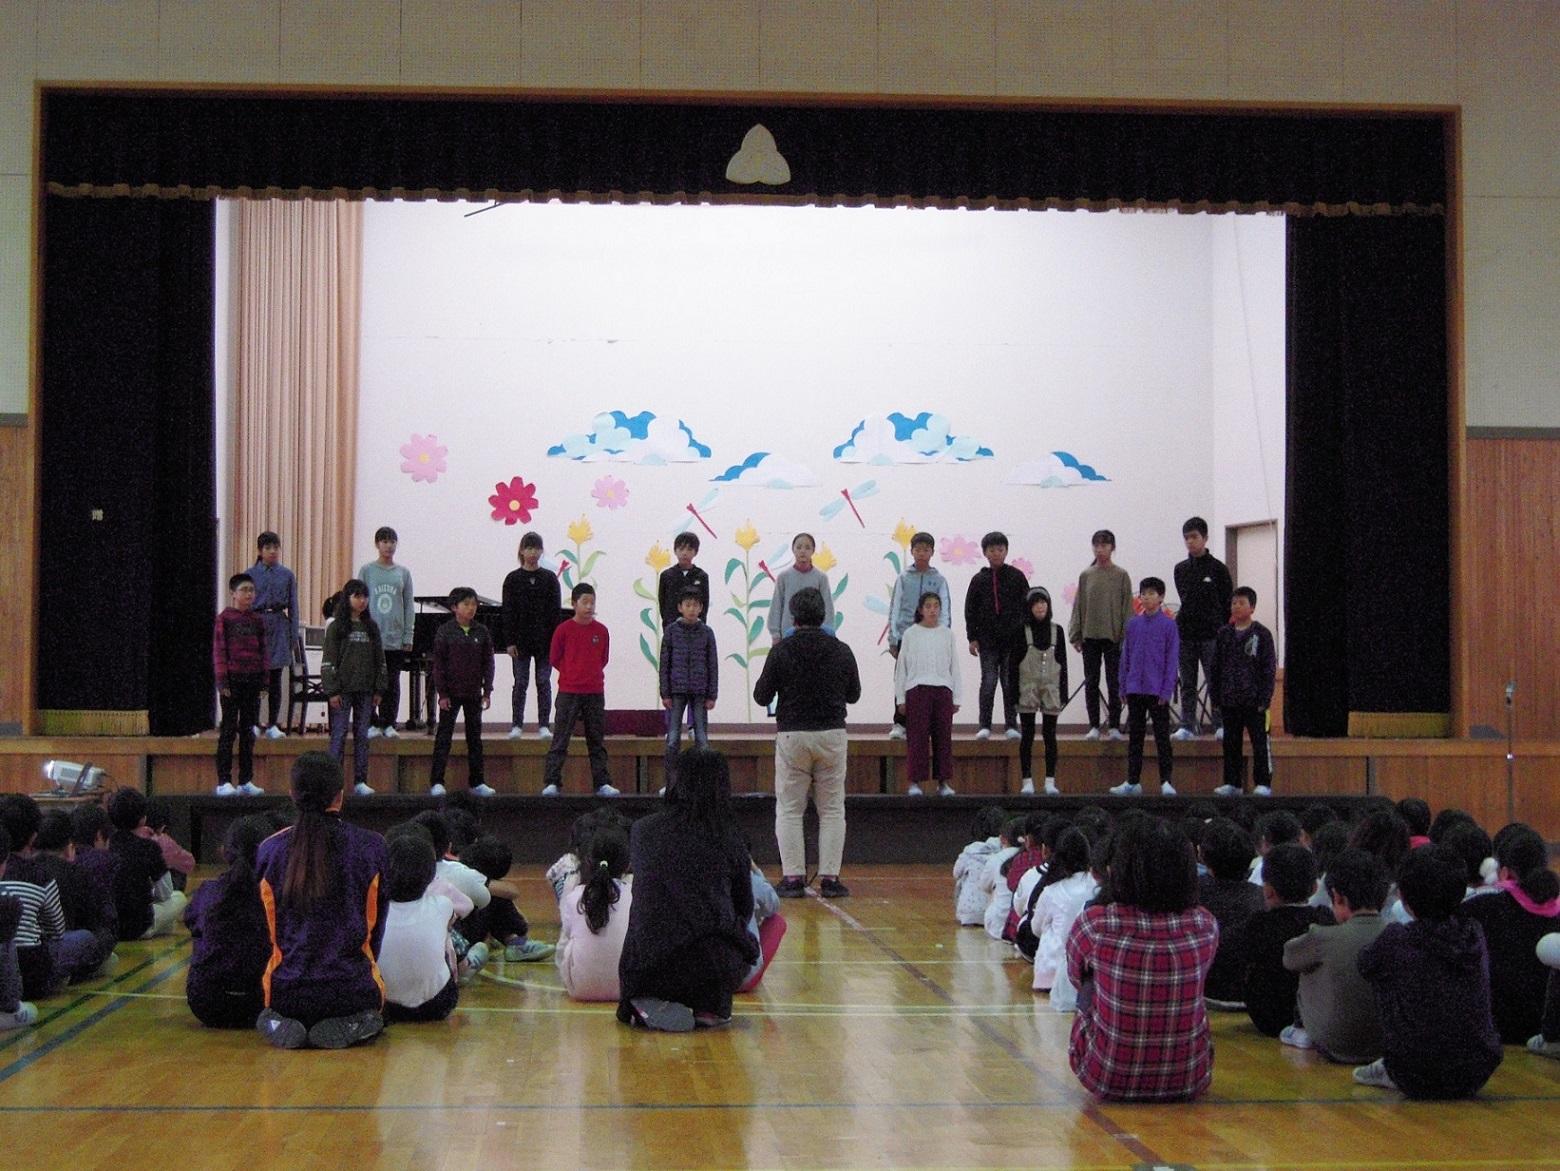 1029卒業音楽会の曲披露(6年)